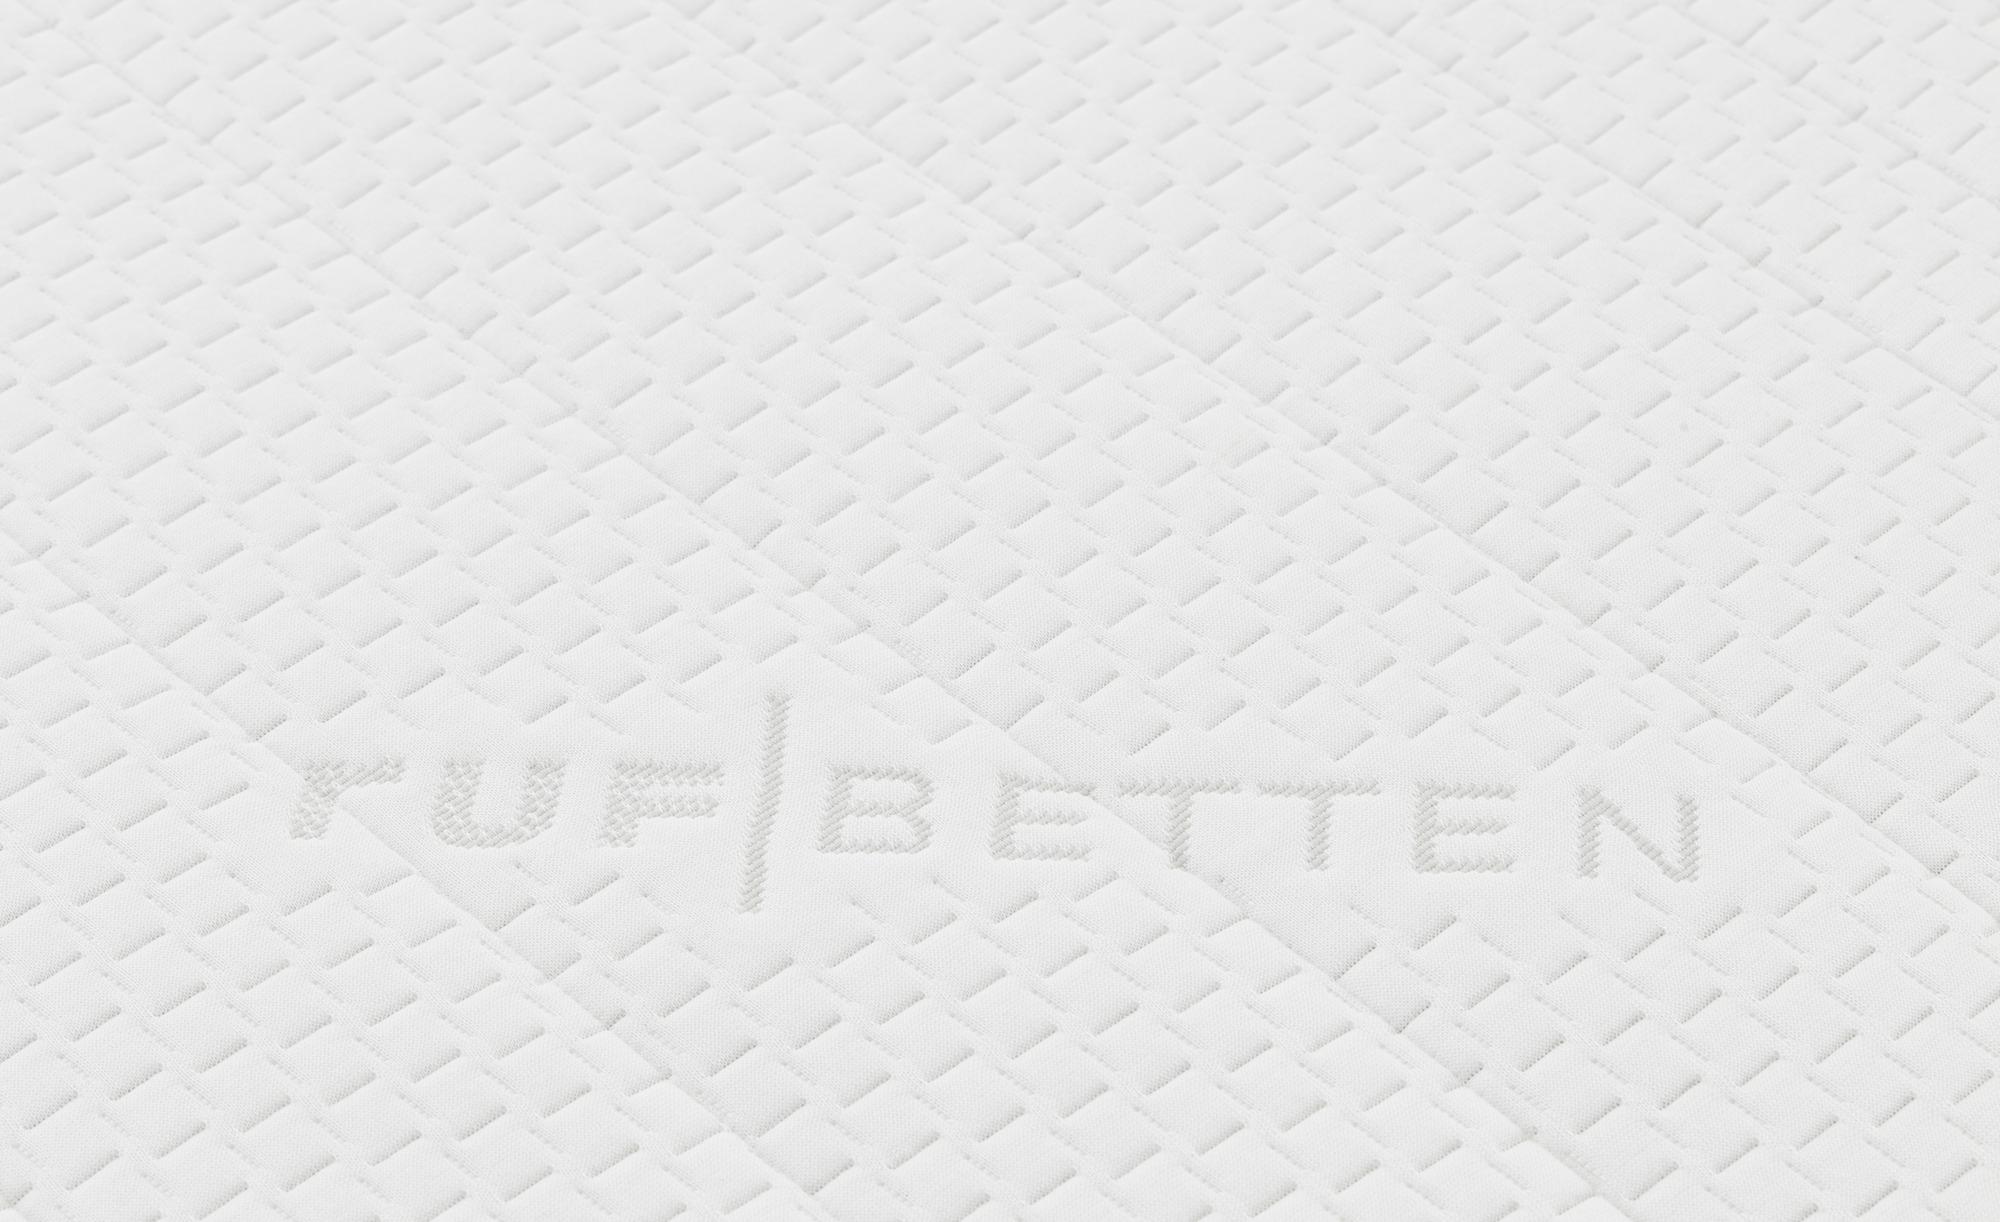 RUF Polsterbett  Casita ¦ beige ¦ Maße (cm): B: 186 H: 105 Betten > Polsterbetten - Höffner